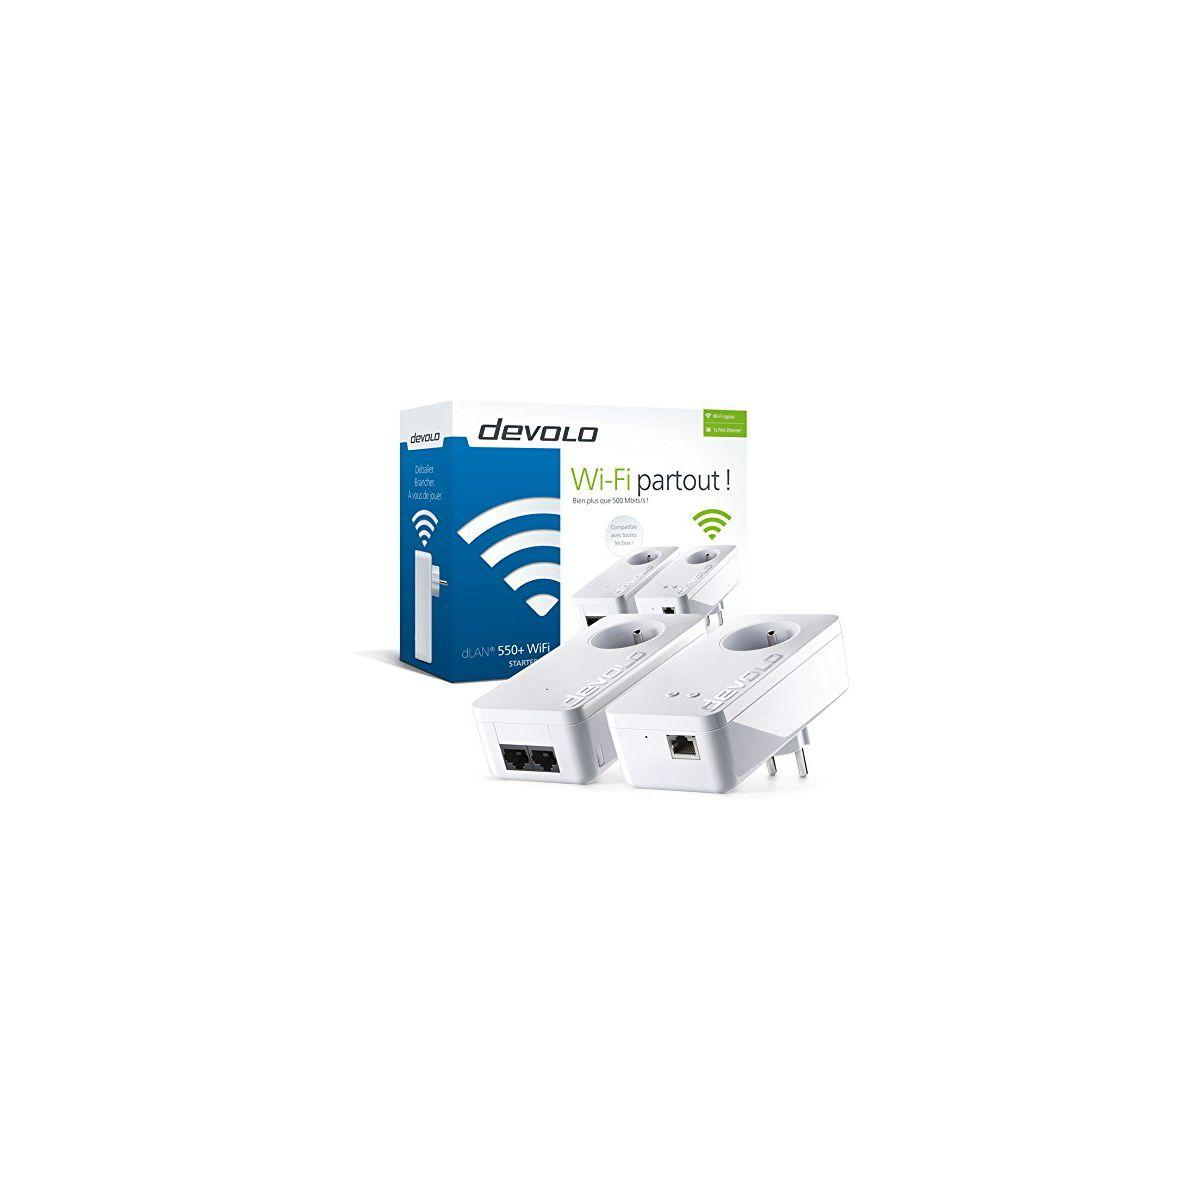 Cpl duo devolo dlan 550+ - starter kit a - livraison offerte : code liv